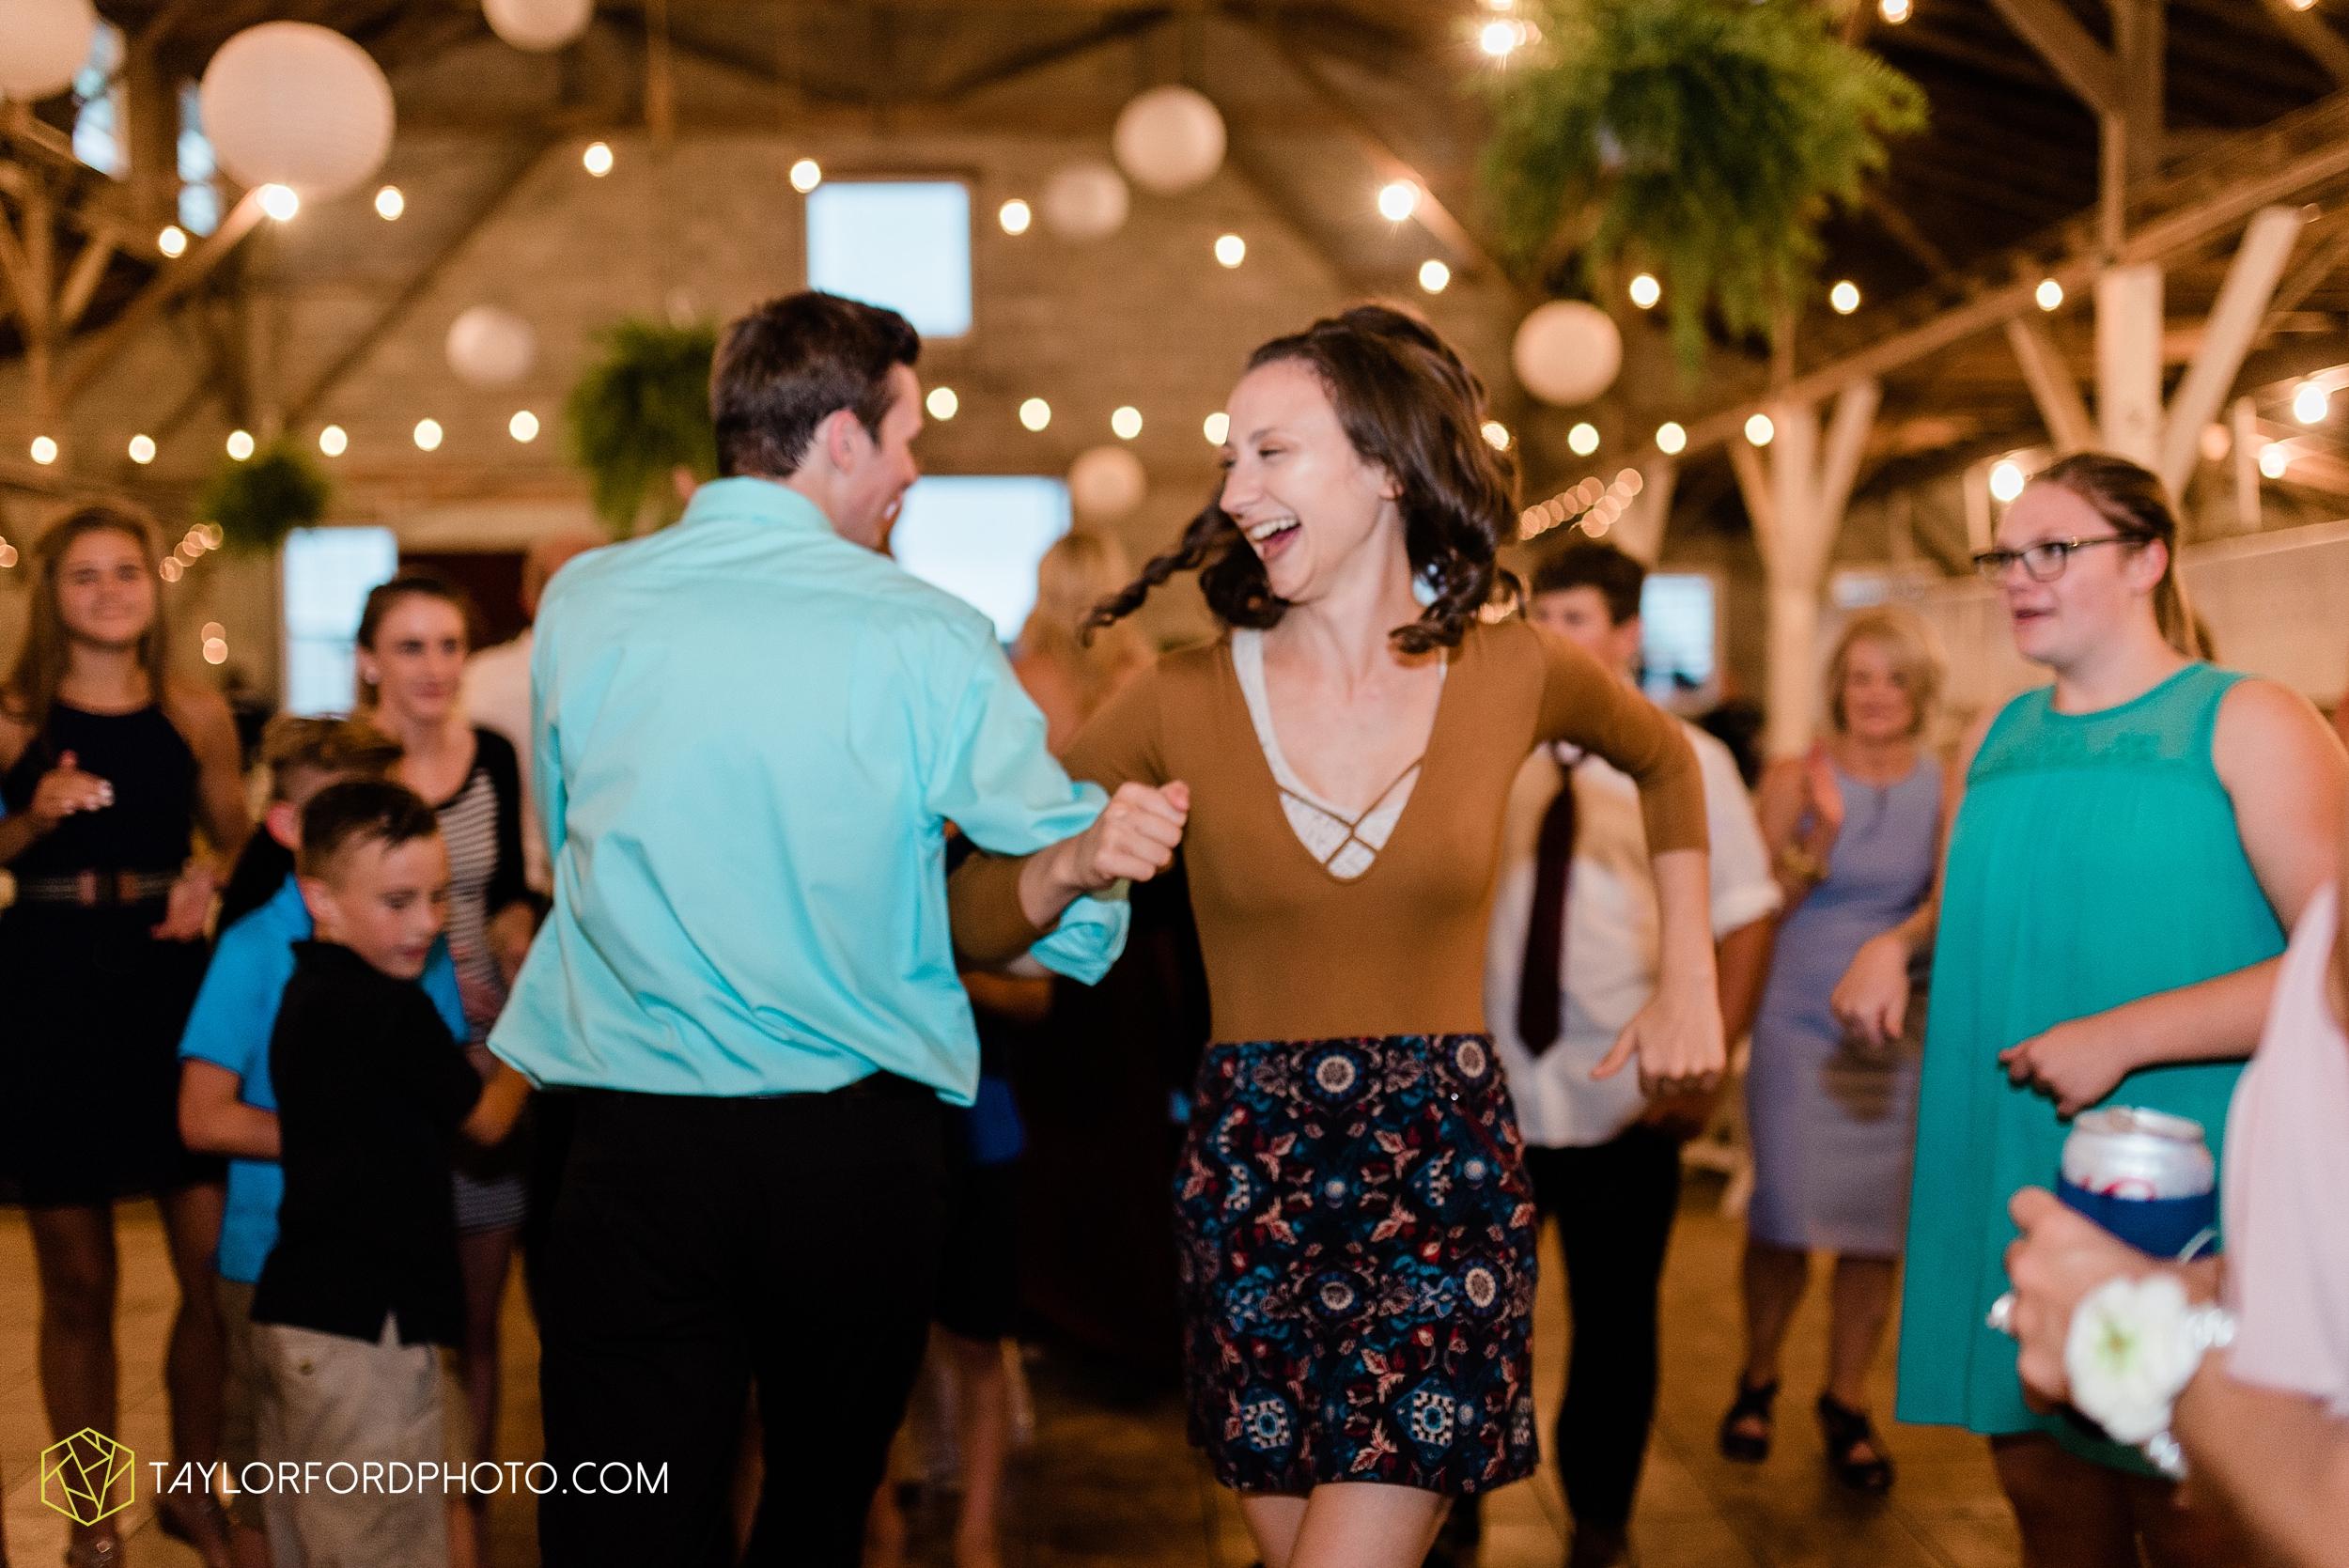 van-wert-ohio-first-united-methodist-church-county-dairy-barn-wedding-photographer-taylor-ford-photography_9887.jpg